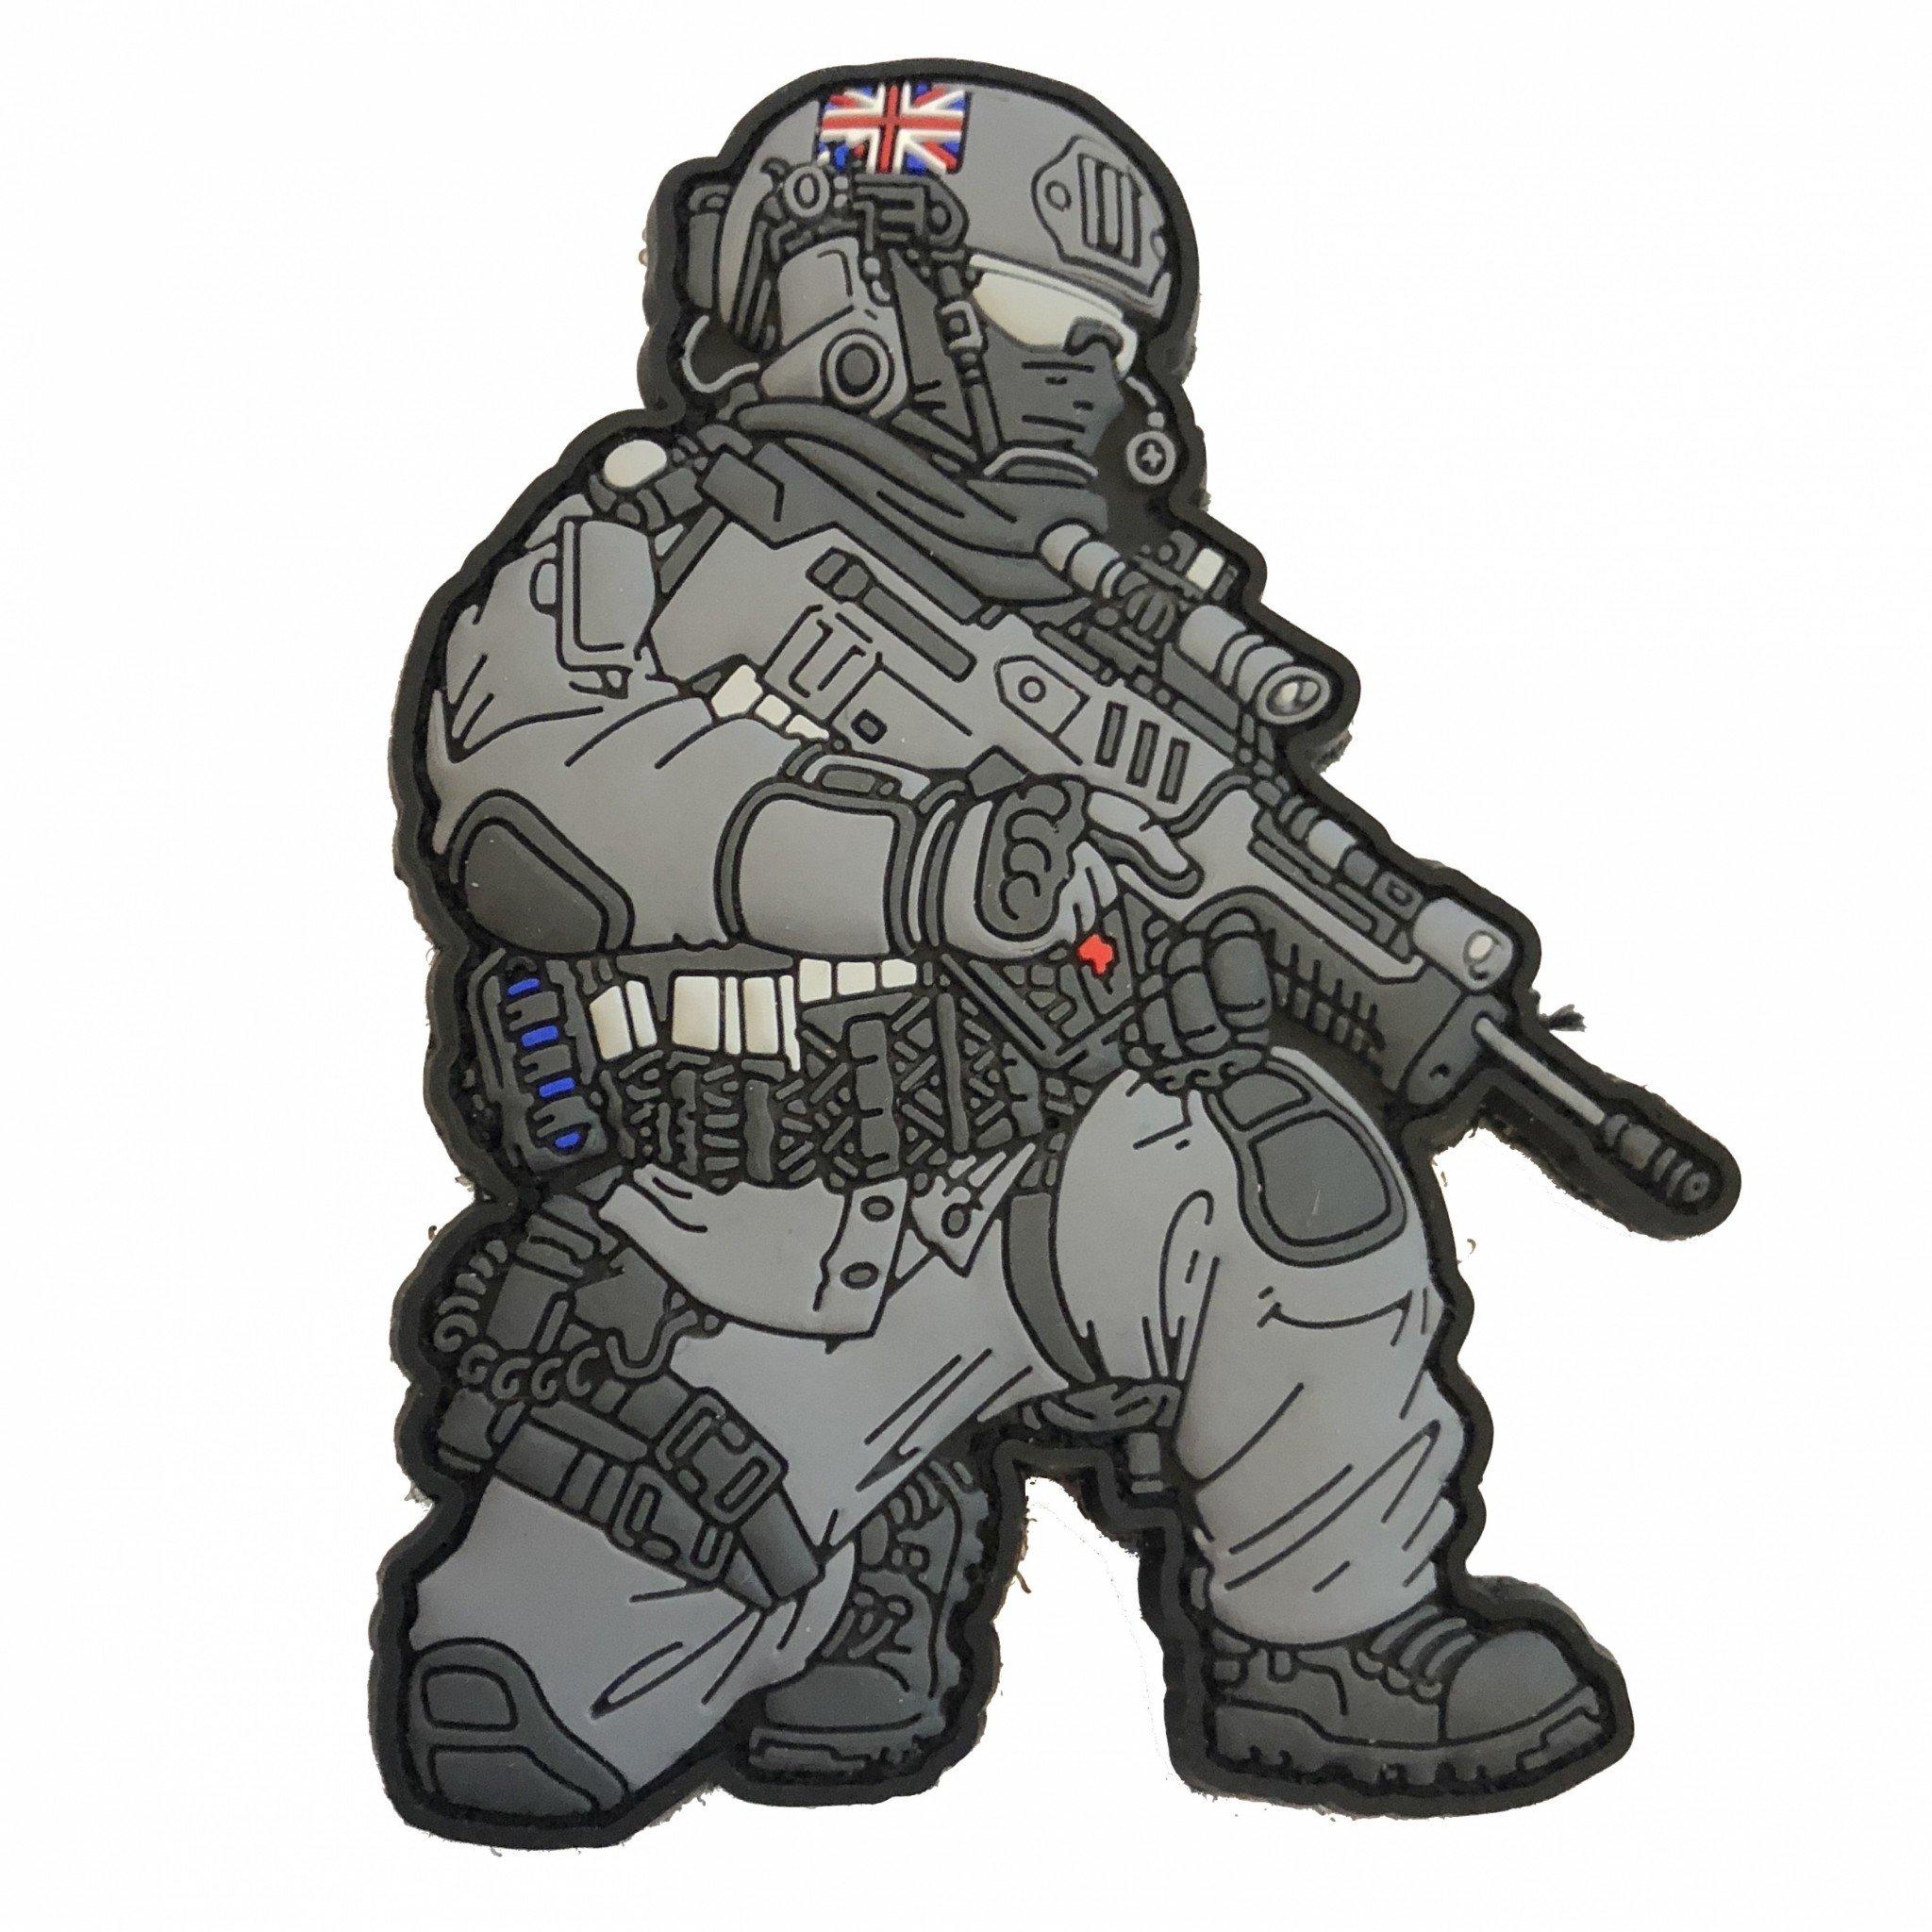 SOF – Operator Patch – UK SAS